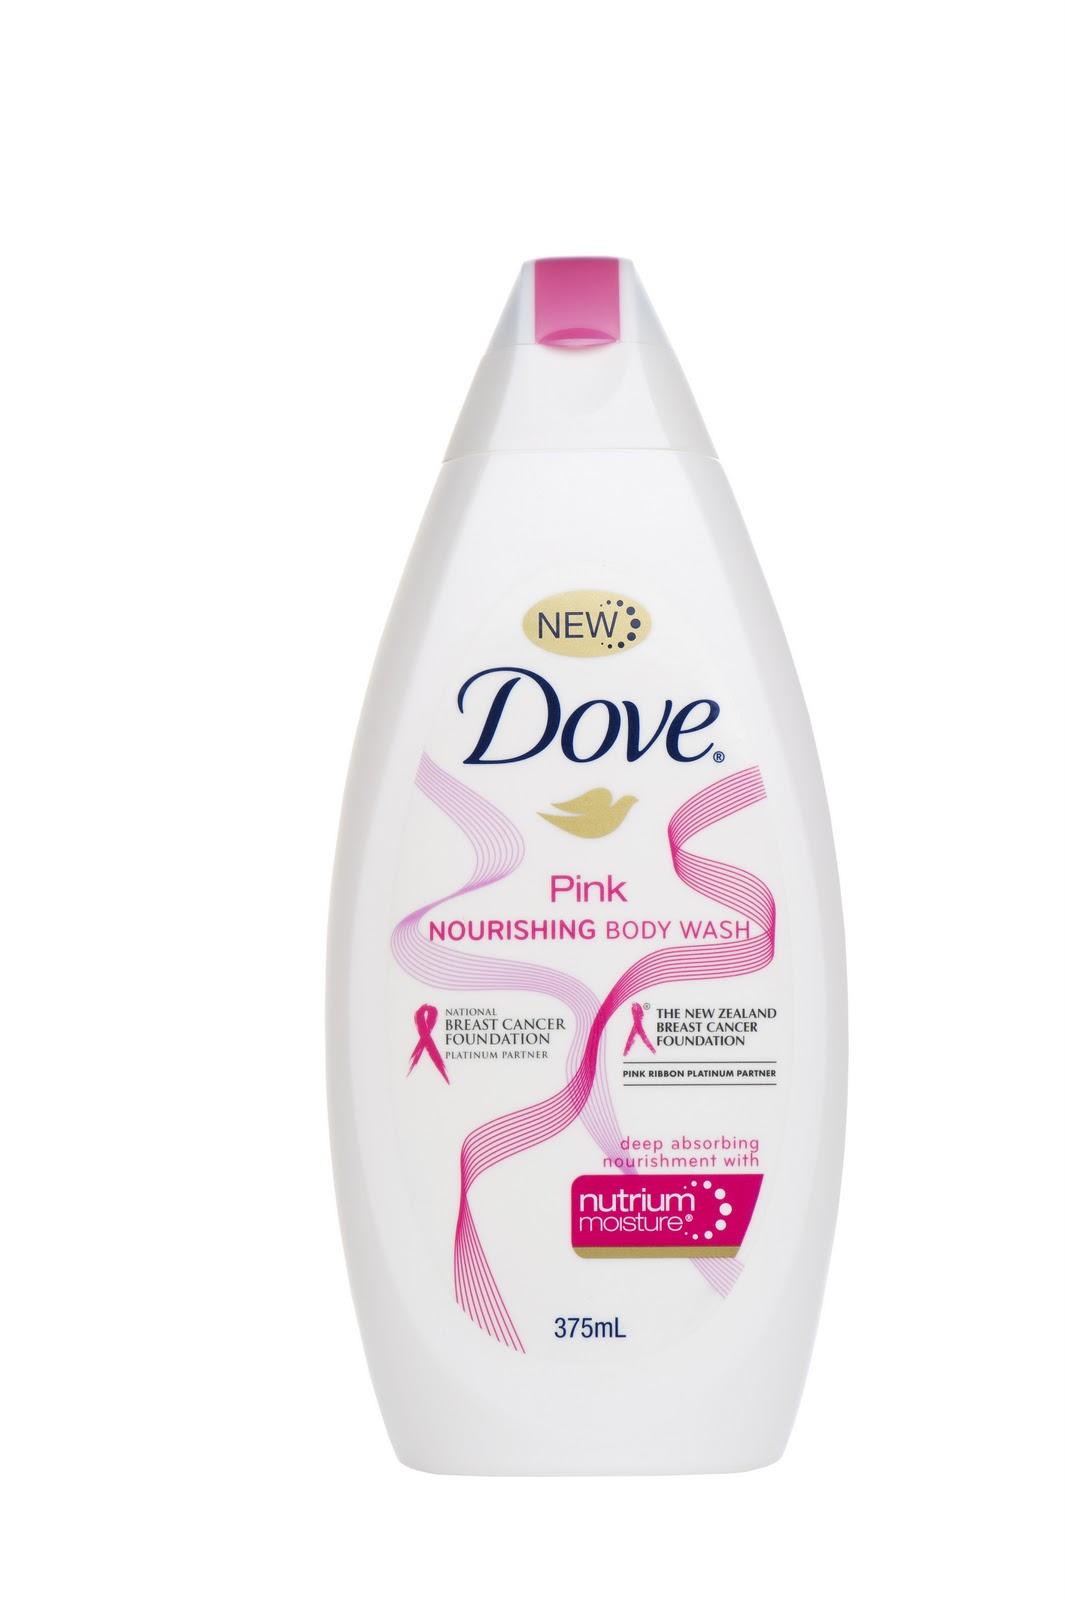 http://1.bp.blogspot.com/-f4re6esEs54/TqO-0urYlXI/AAAAAAAAAW0/nP0dtEbgk34/s1600/dove+pink.jpg